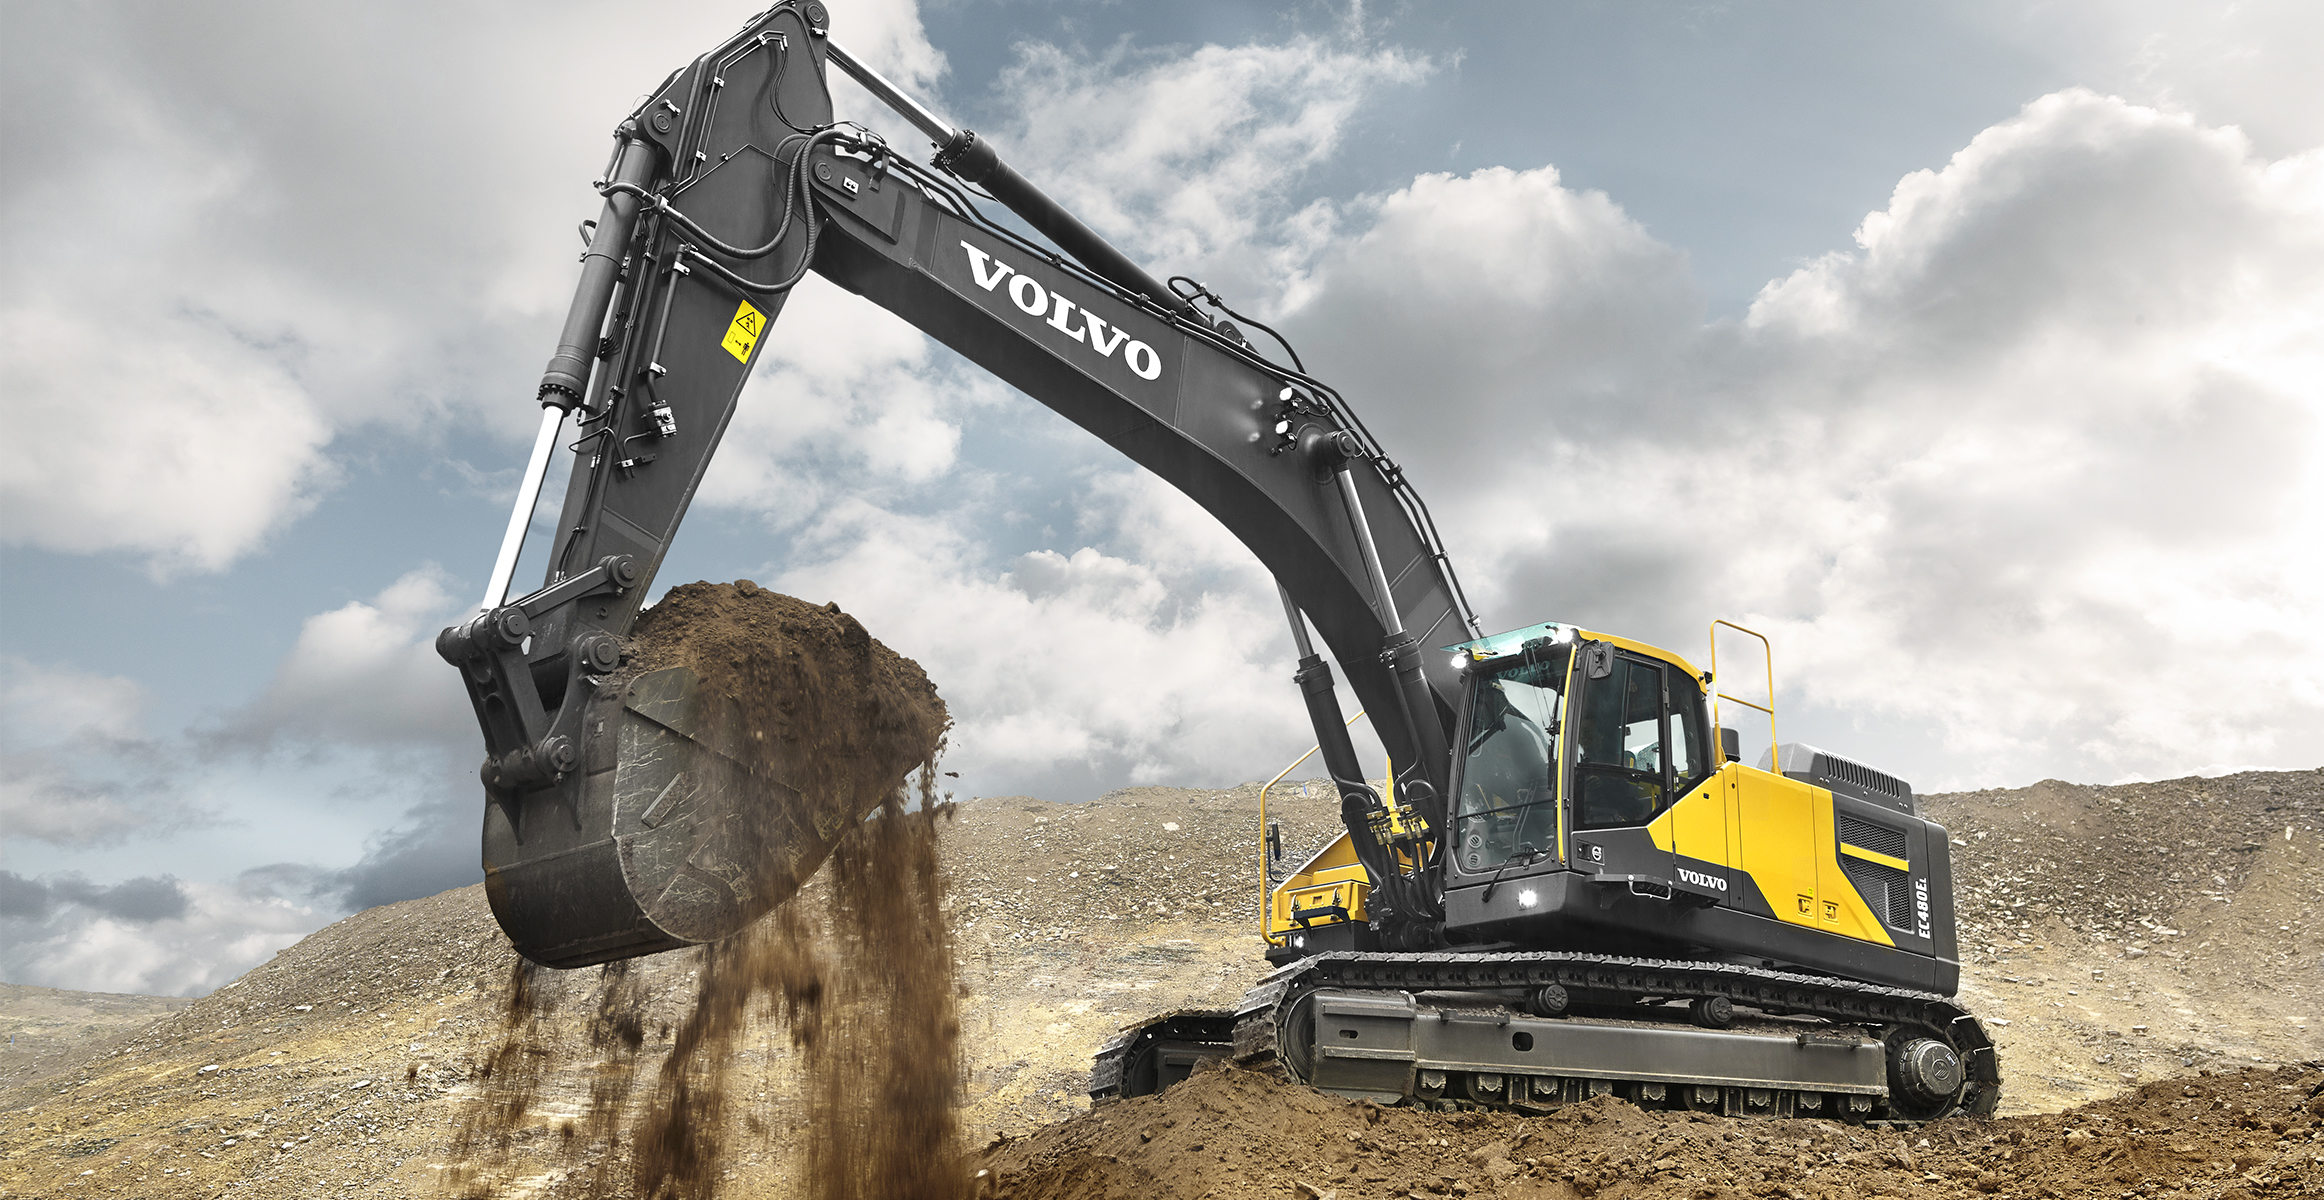 EC480E | Excavators | Overview | Volvo Construction Equipment